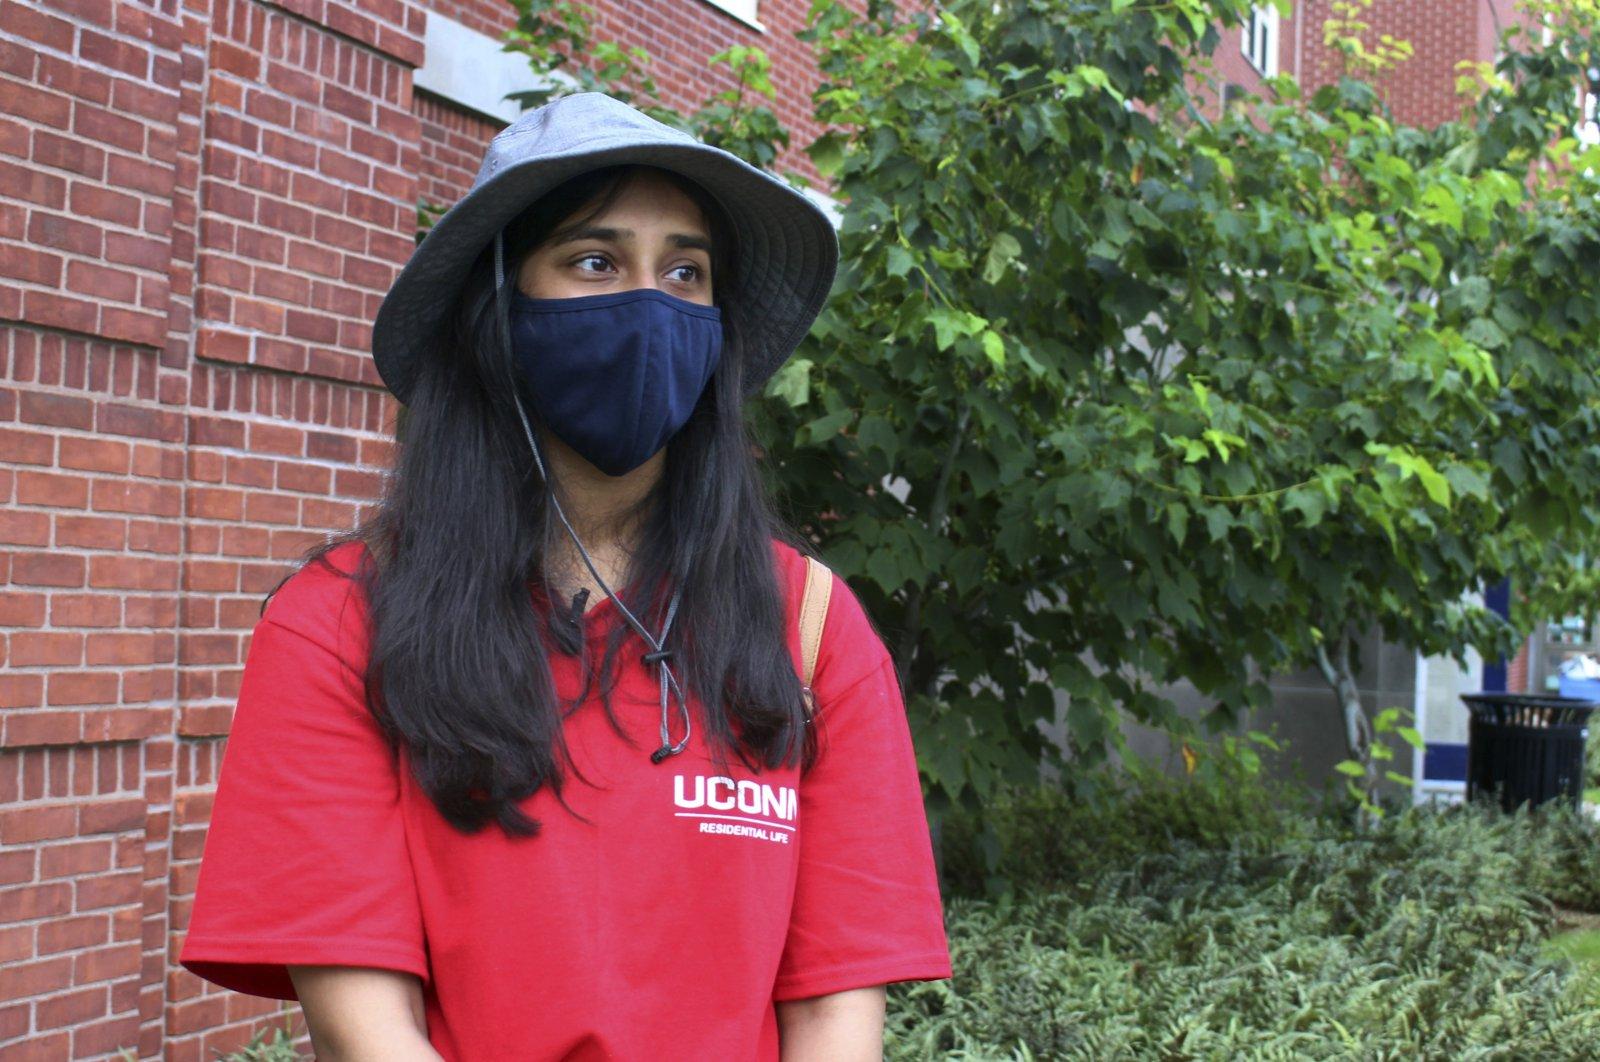 UConn sophomore Sahiti Bhyravavajhala assists students moving into Shippee Hall on campus, Storrs, Connecticut, U.S., Aug. 27, 2021. (AP Photo)